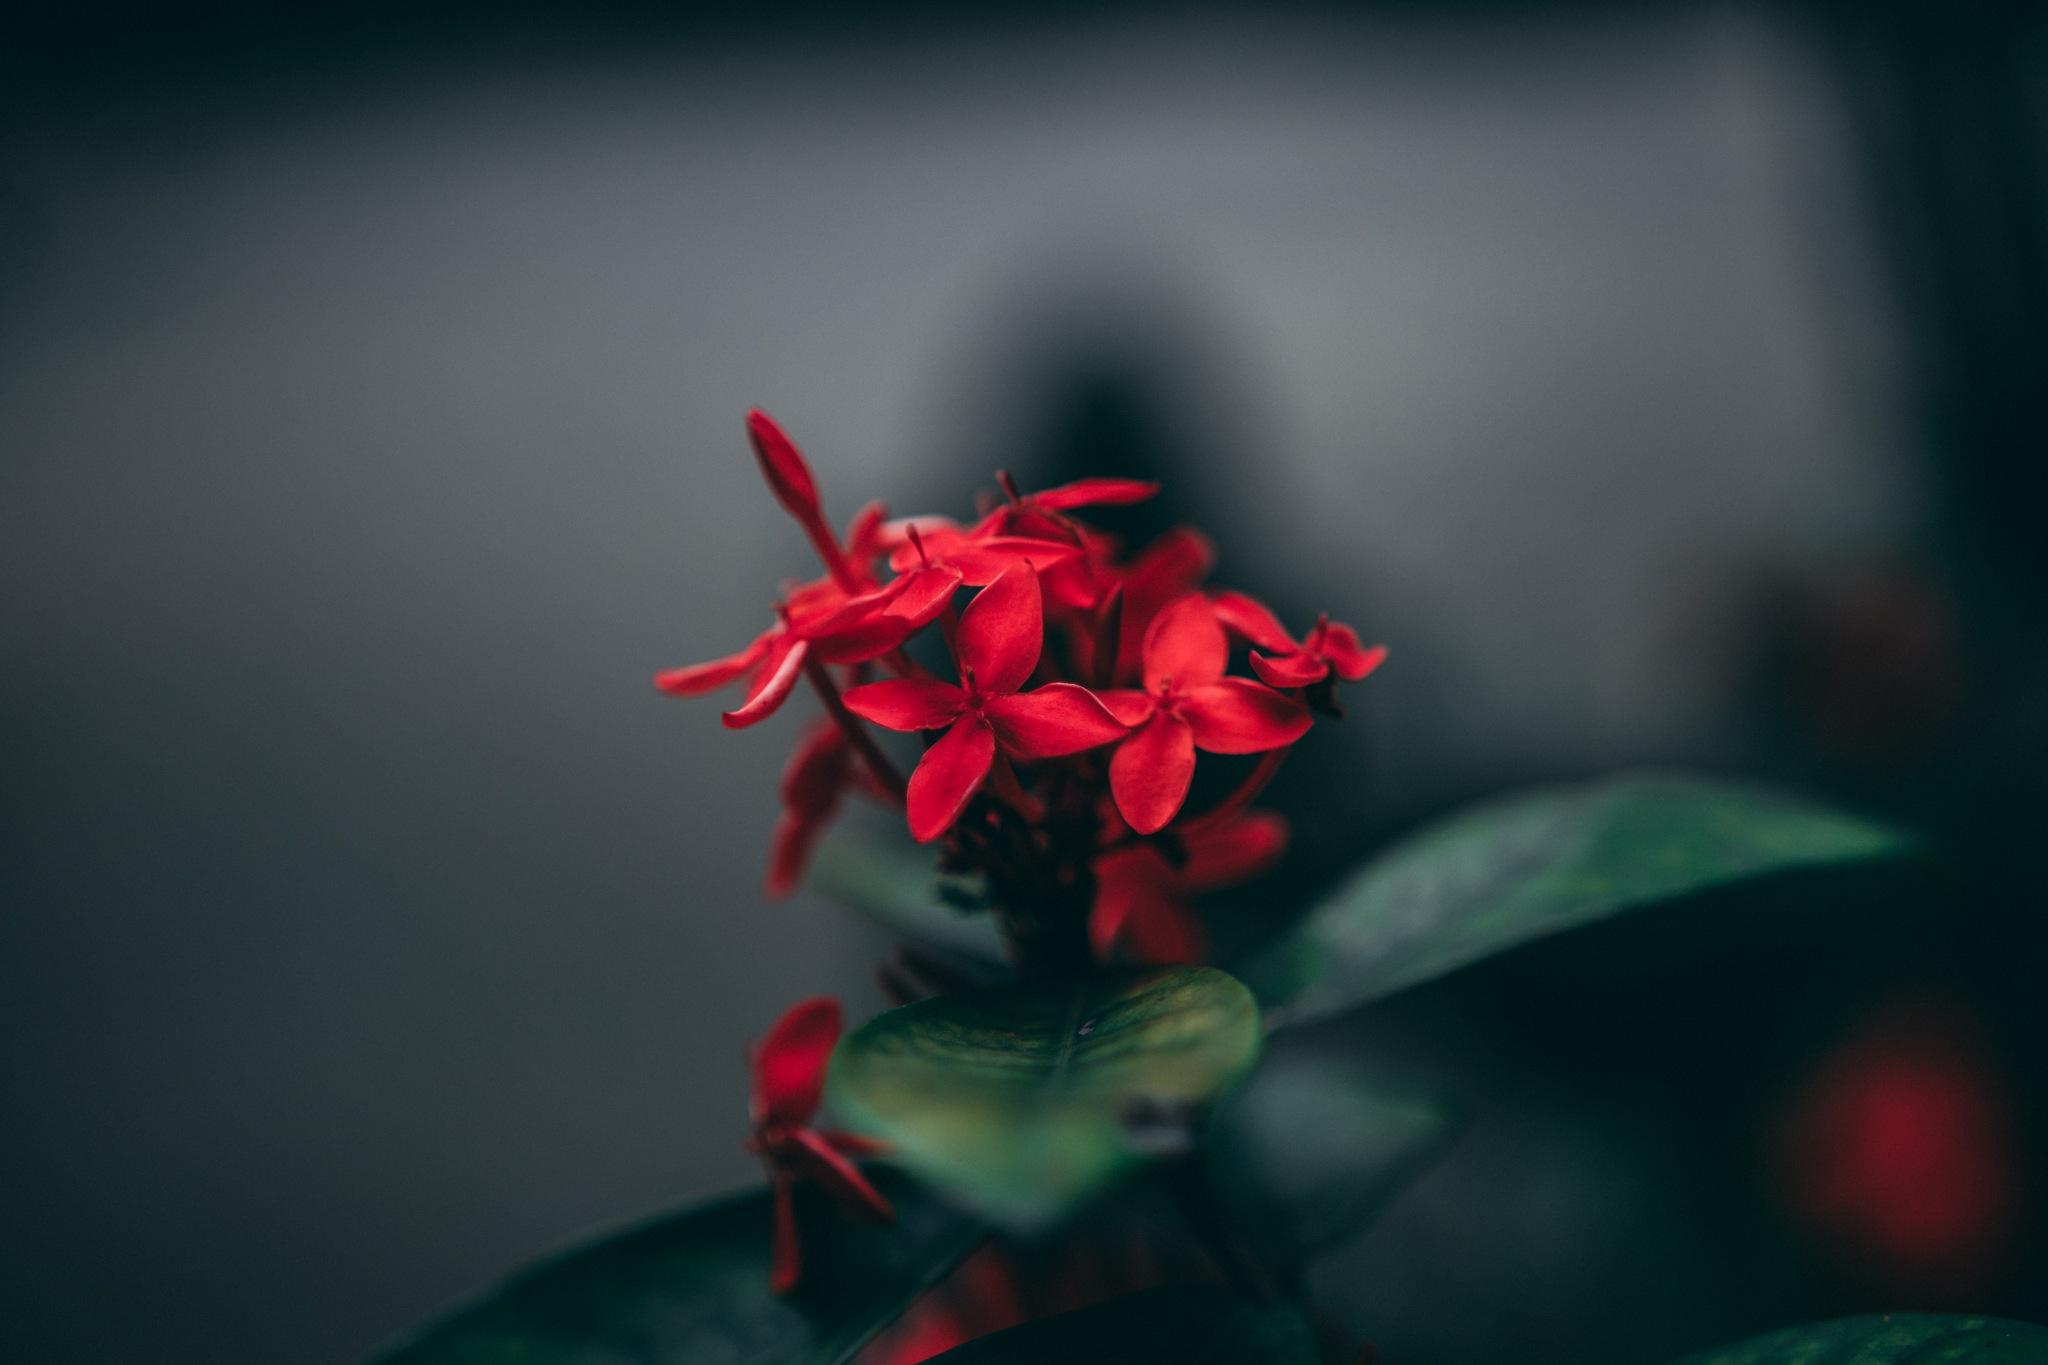 Red Crush by Zhu Hongzhi